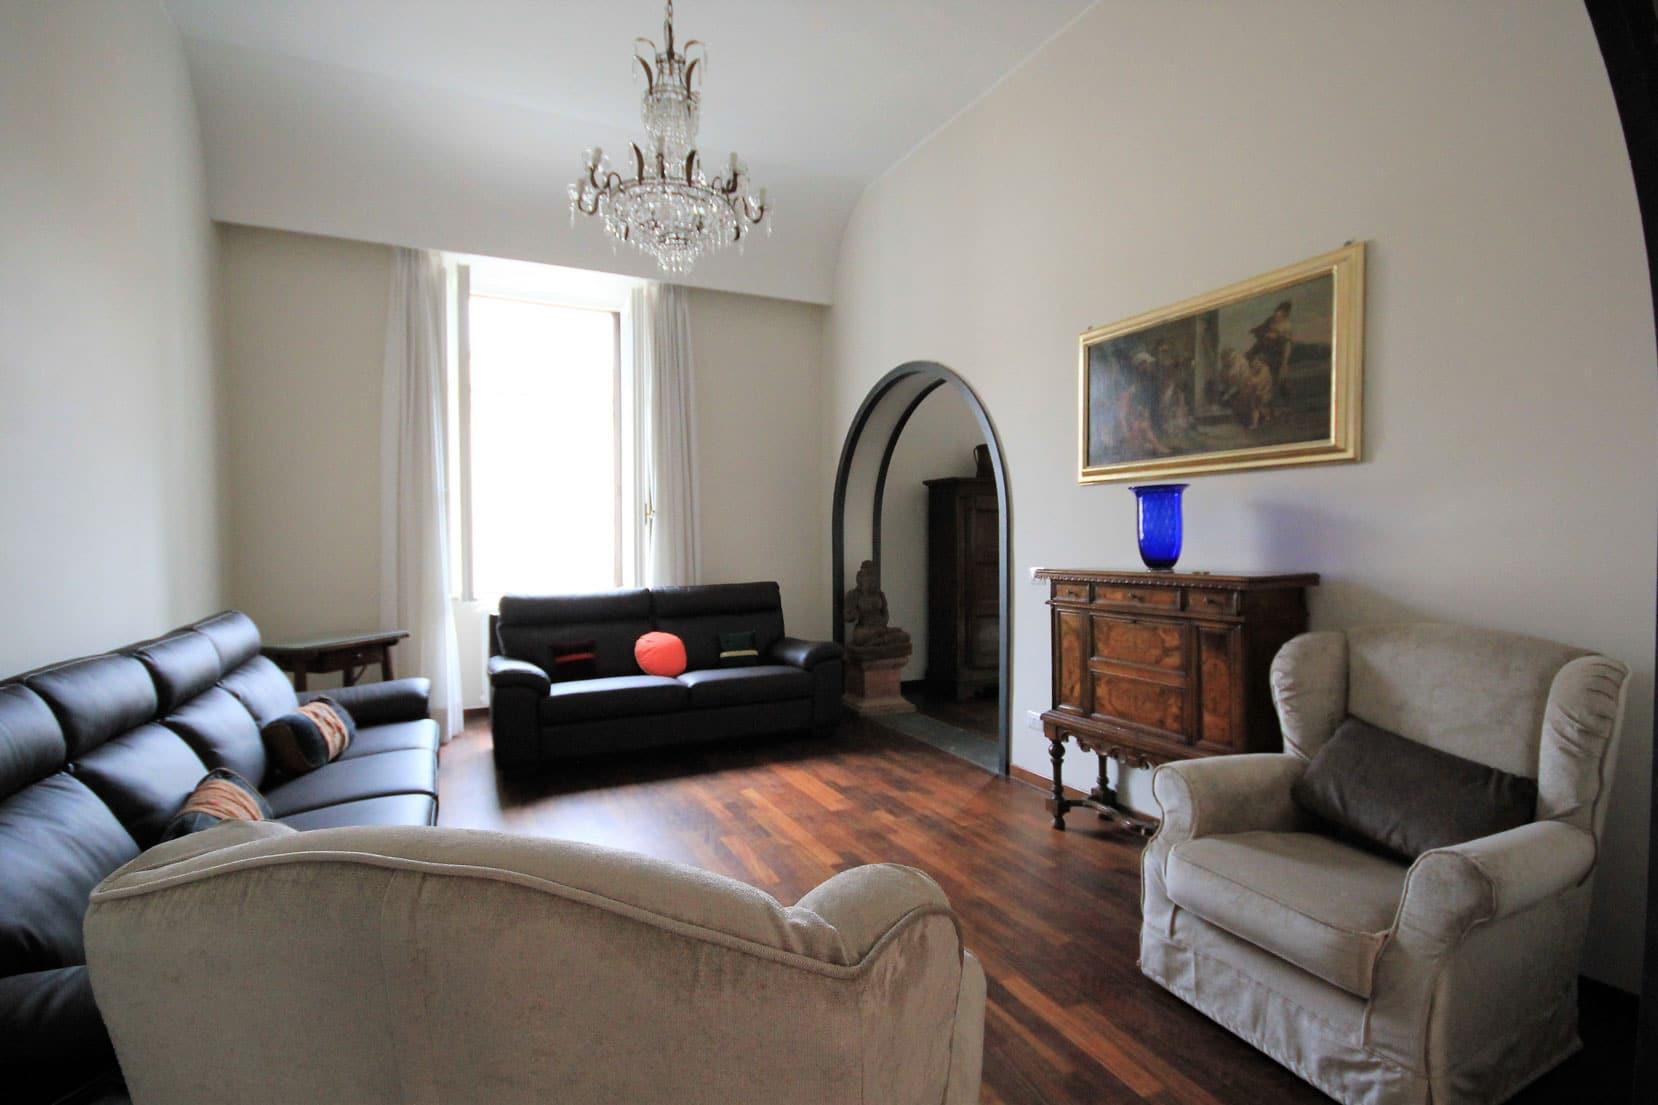 Luxury Apartment for Rent in Rome Centre – Via Veneto